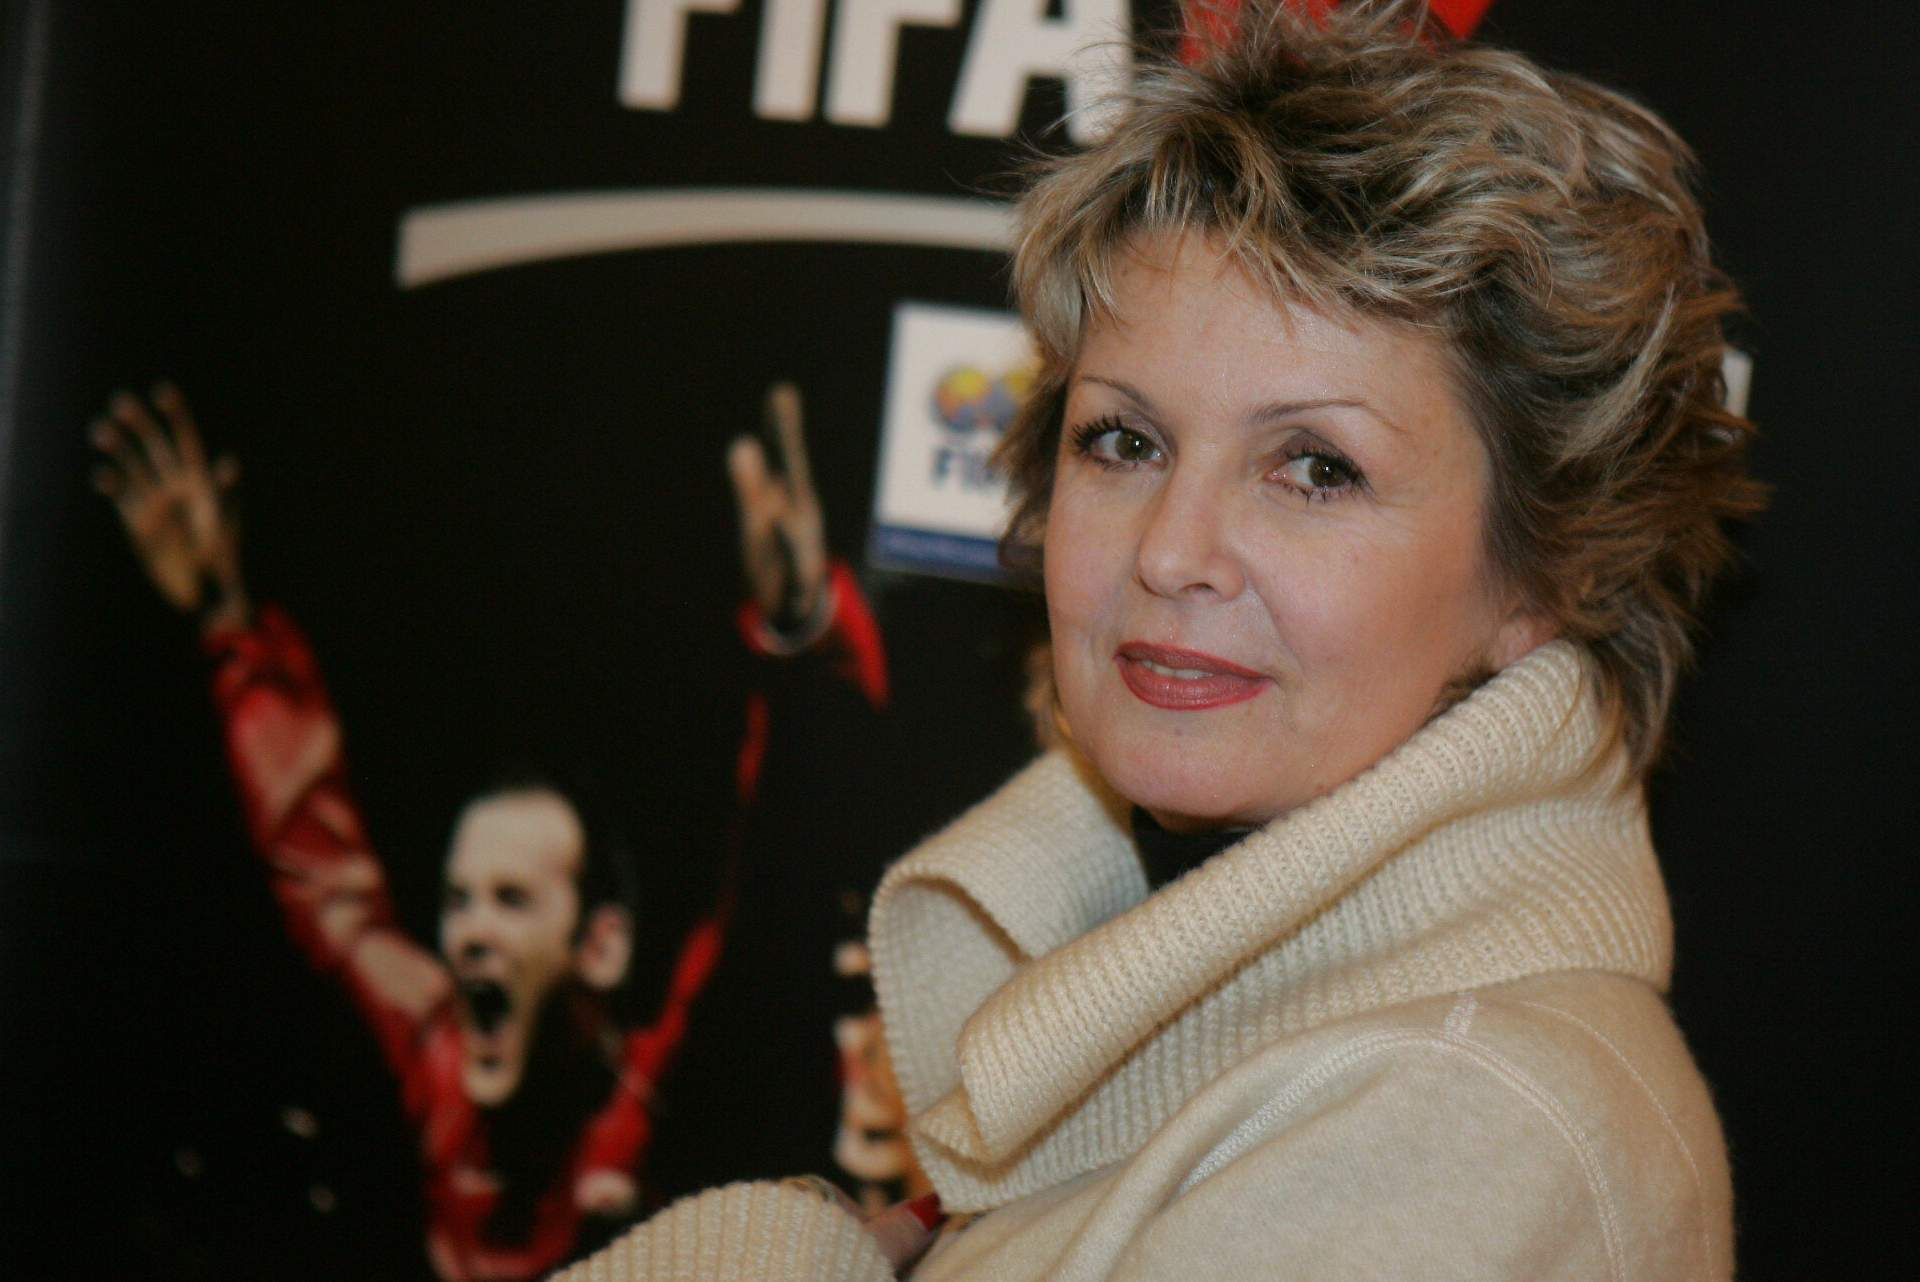 Gabriela Kownacka